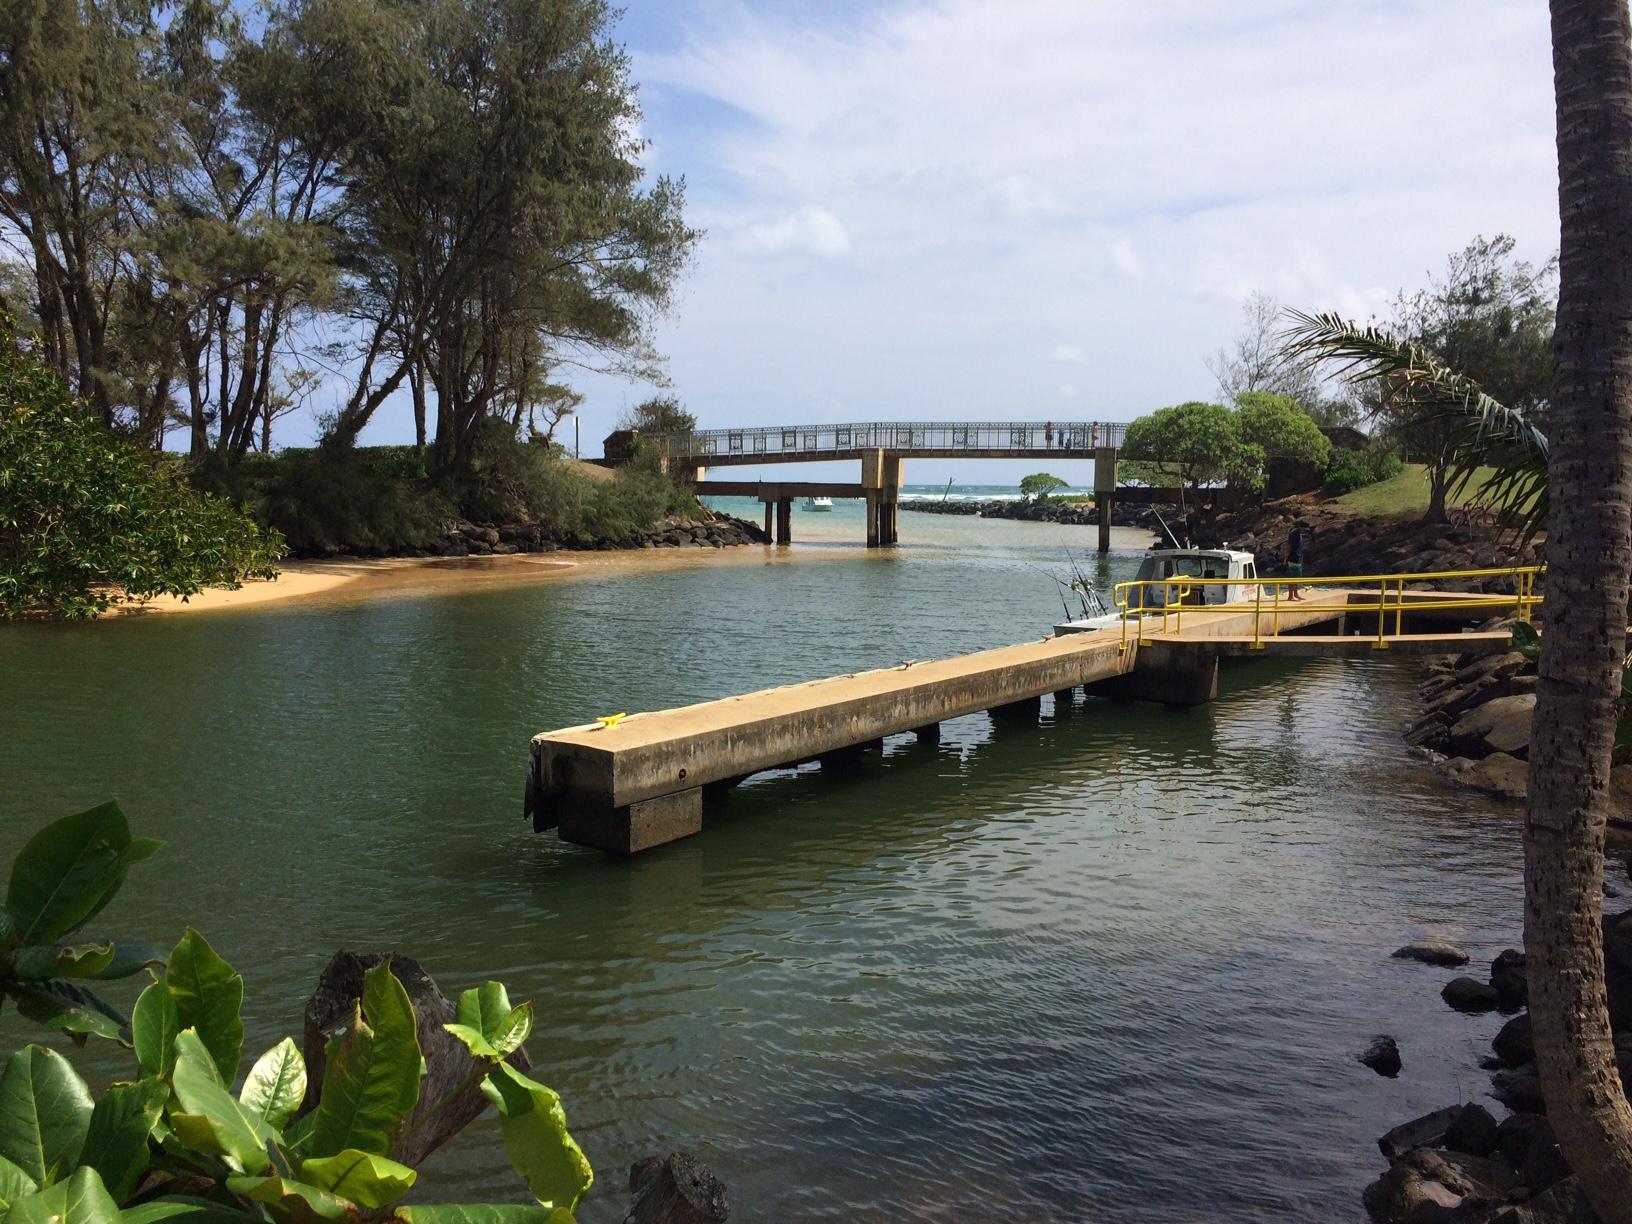 Lihi Canal